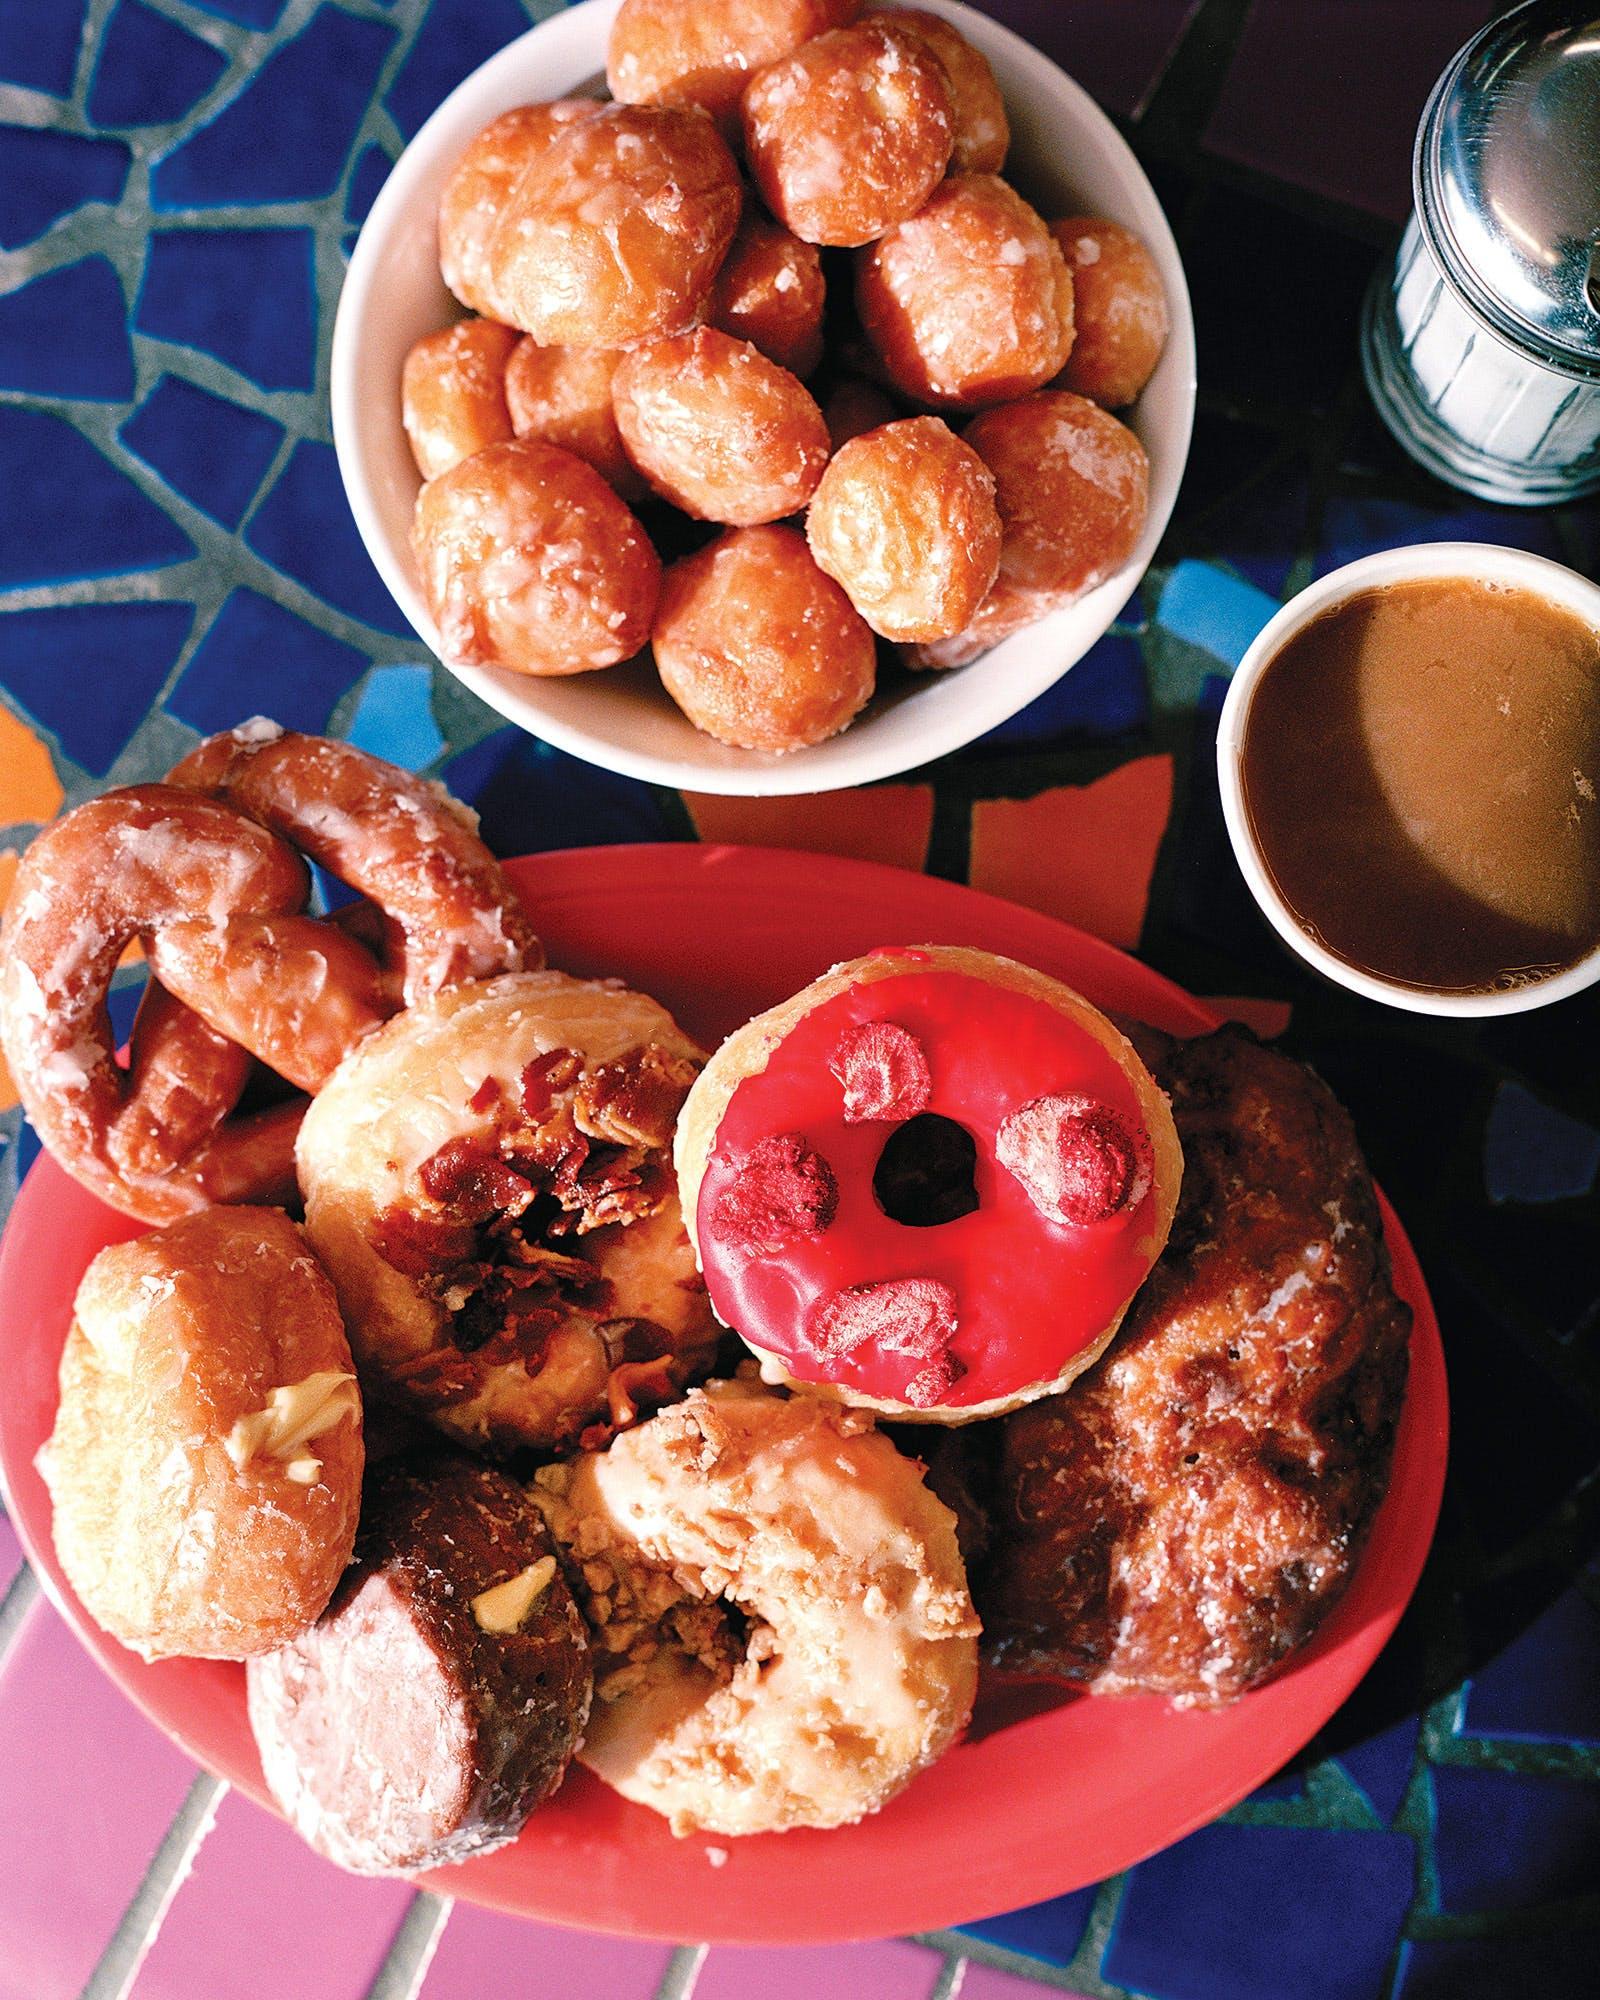 Original Donut Shop san antonio holidays